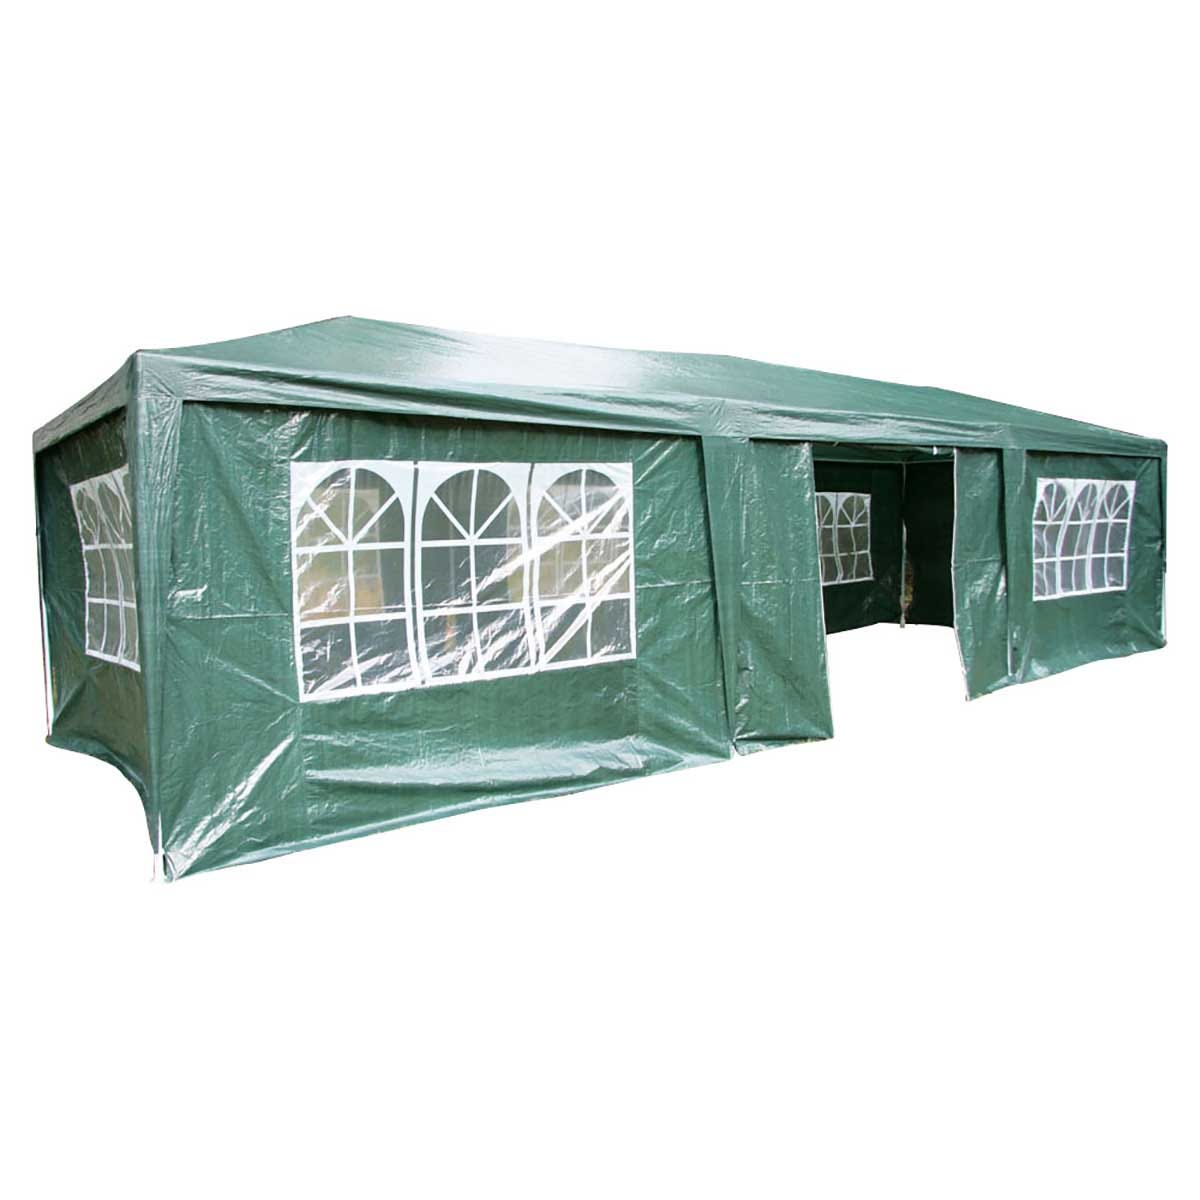 Airwave 9m x 3m Value Party Tent Gazebo - Green